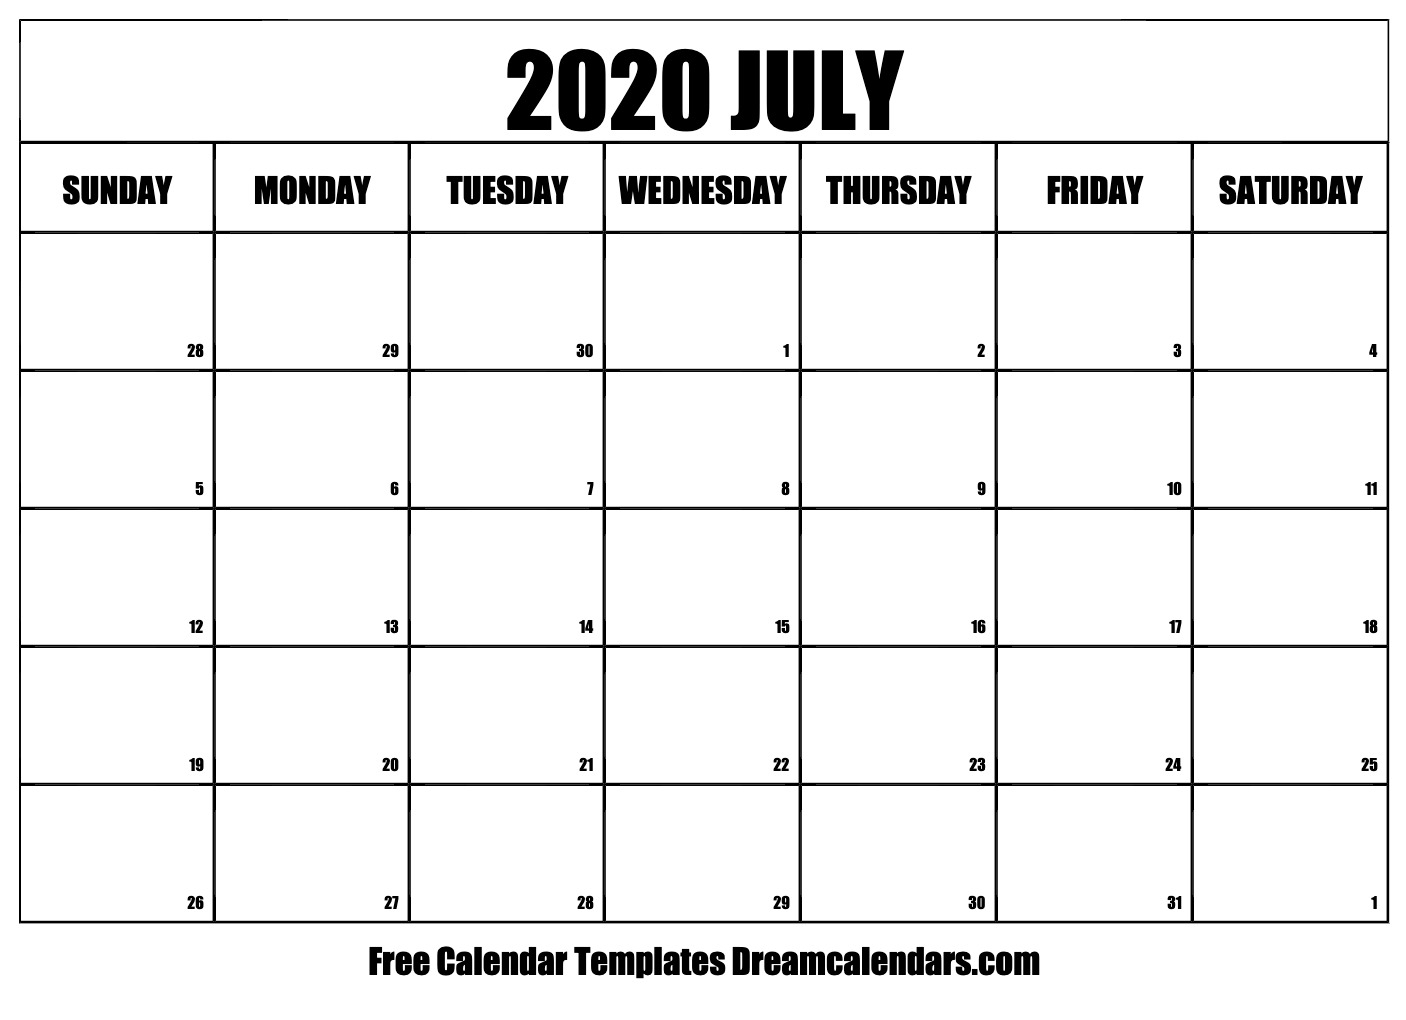 Free July 2020 Printable Calendar | Dream Calendars